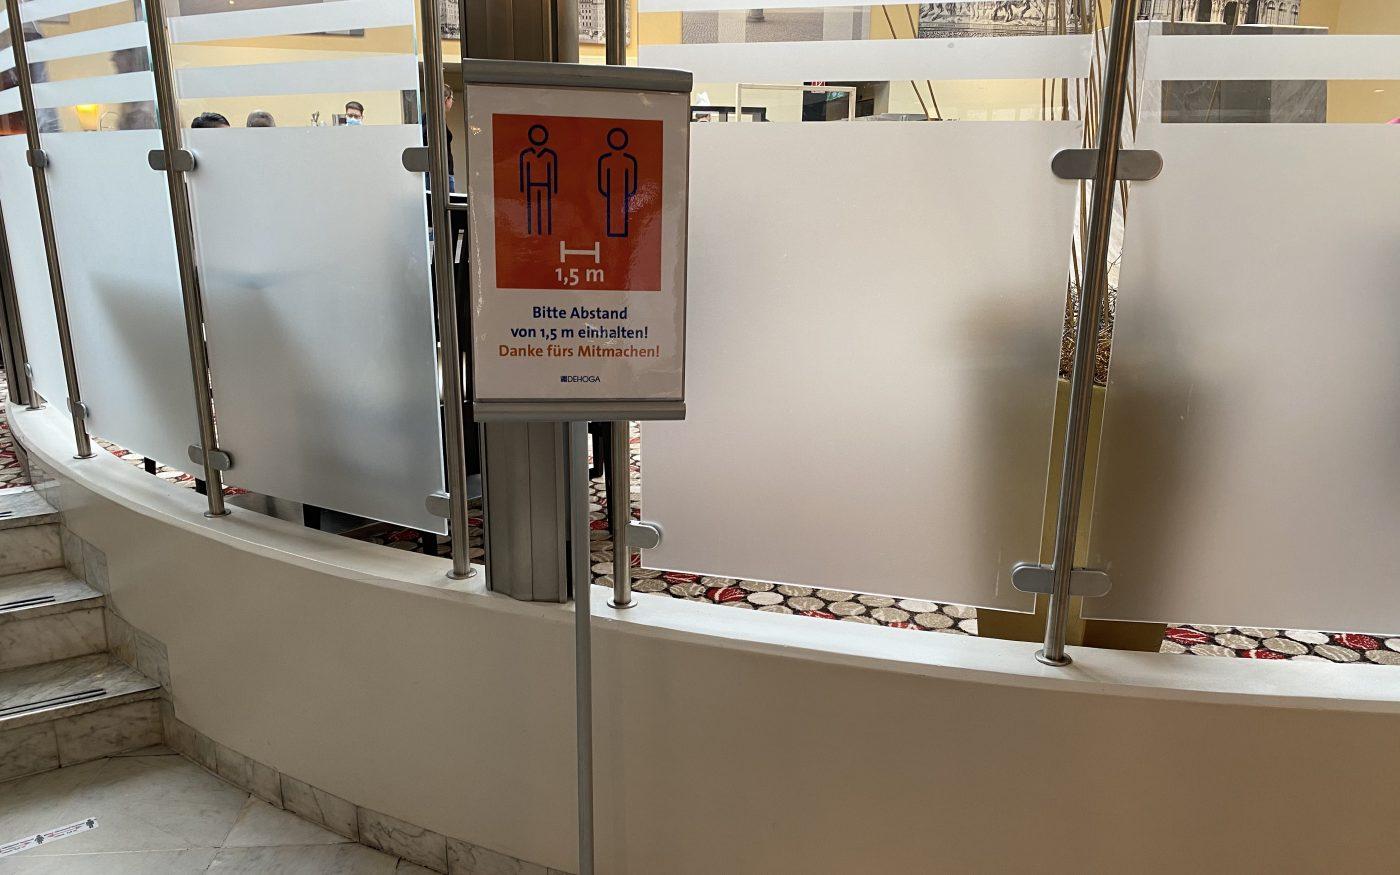 Hilton Dresden zu Coronazeiten